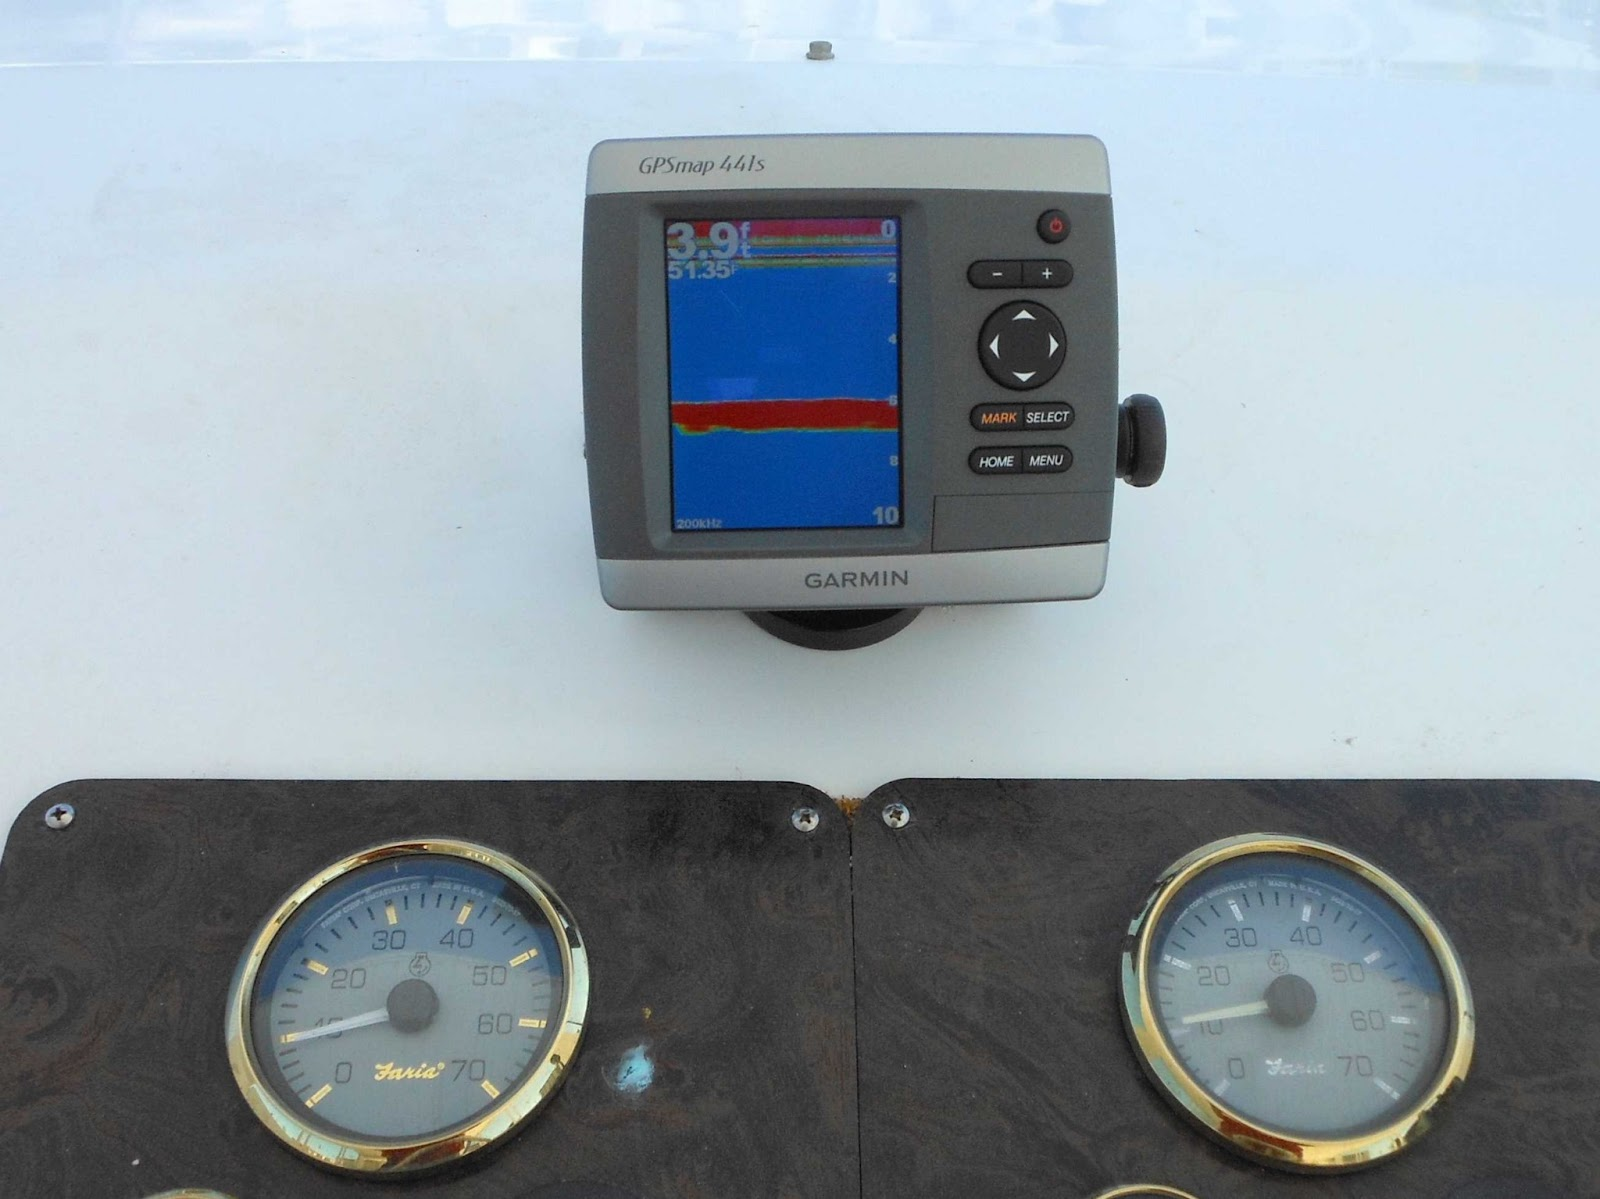 hight resolution of garmin striker series 4 wiring diagram data mapping garmin 160 fishfinder wiring garmin transducer 4 pin